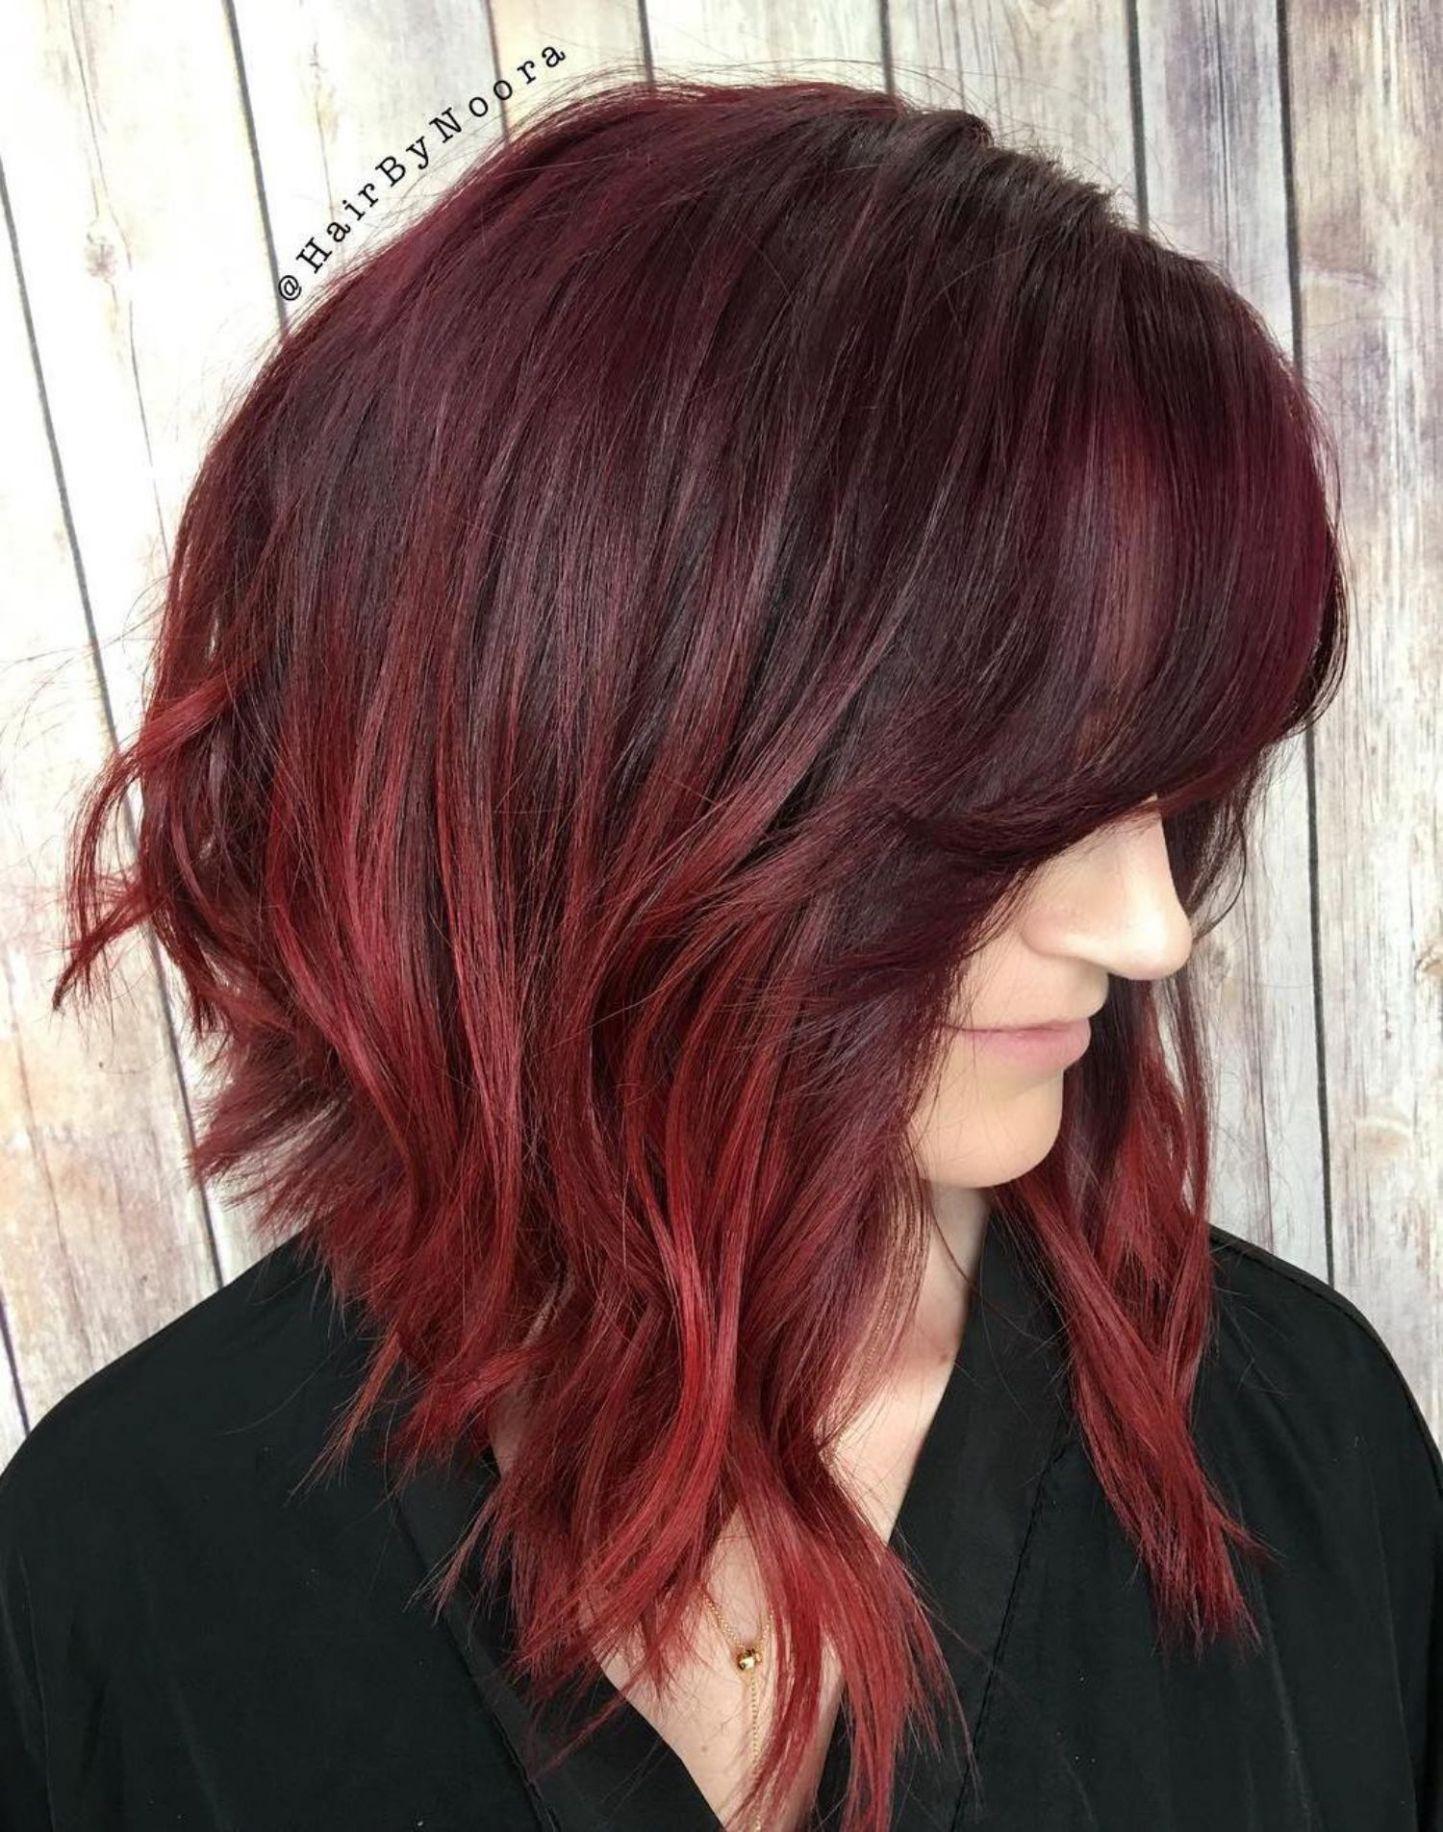 45 Shades Of Burgundy Hair Dark Burgundy Maroon Burgundy With Red Purple And Brown Highlights Burgundy Hair Burgundy Balayage Inverted Long Bob